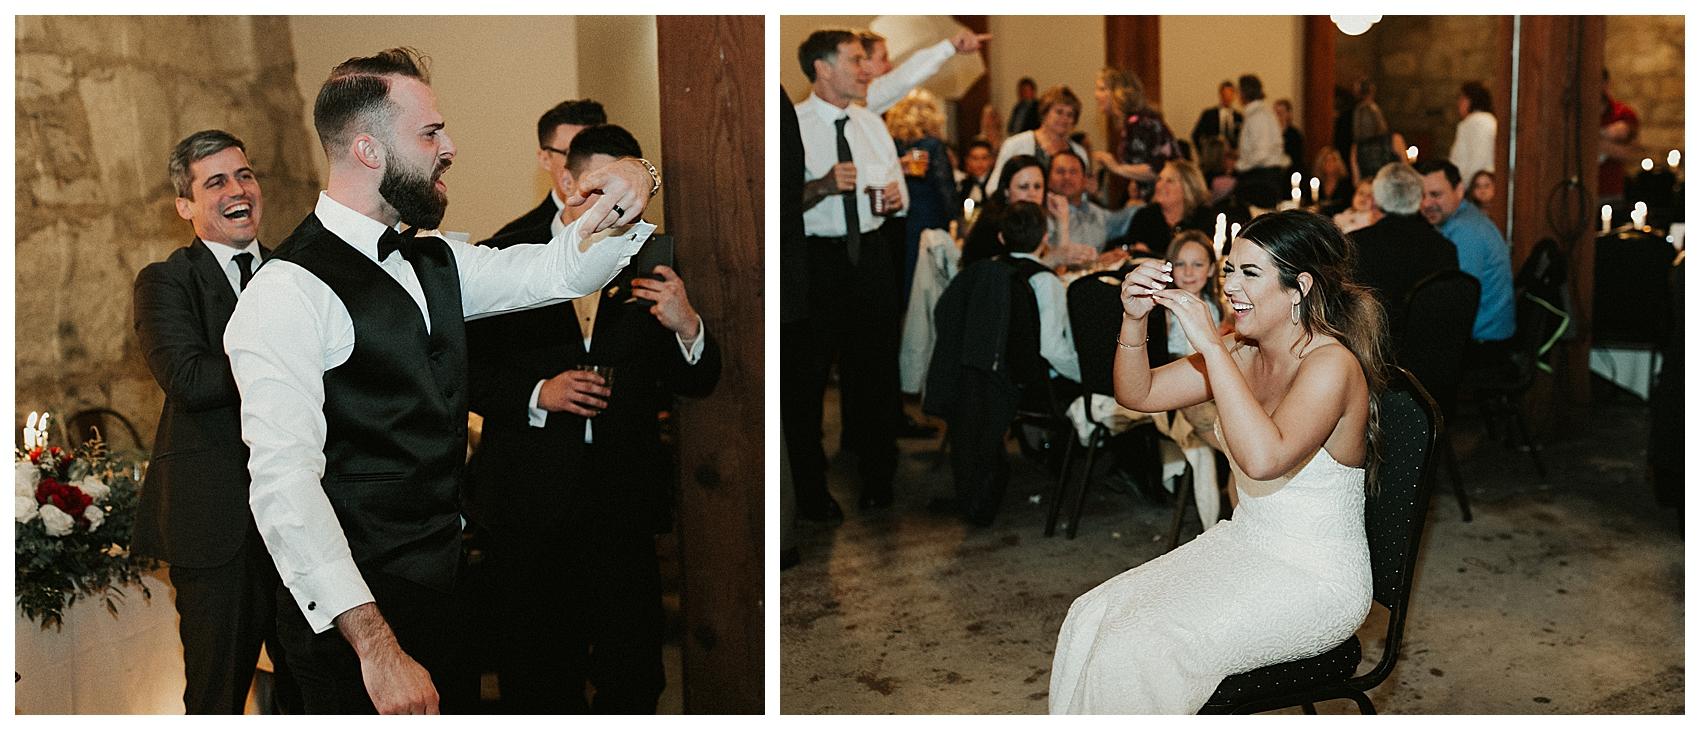 Chateau Rive Spokane Wedding Cassie Trottier Photography01110.jpg